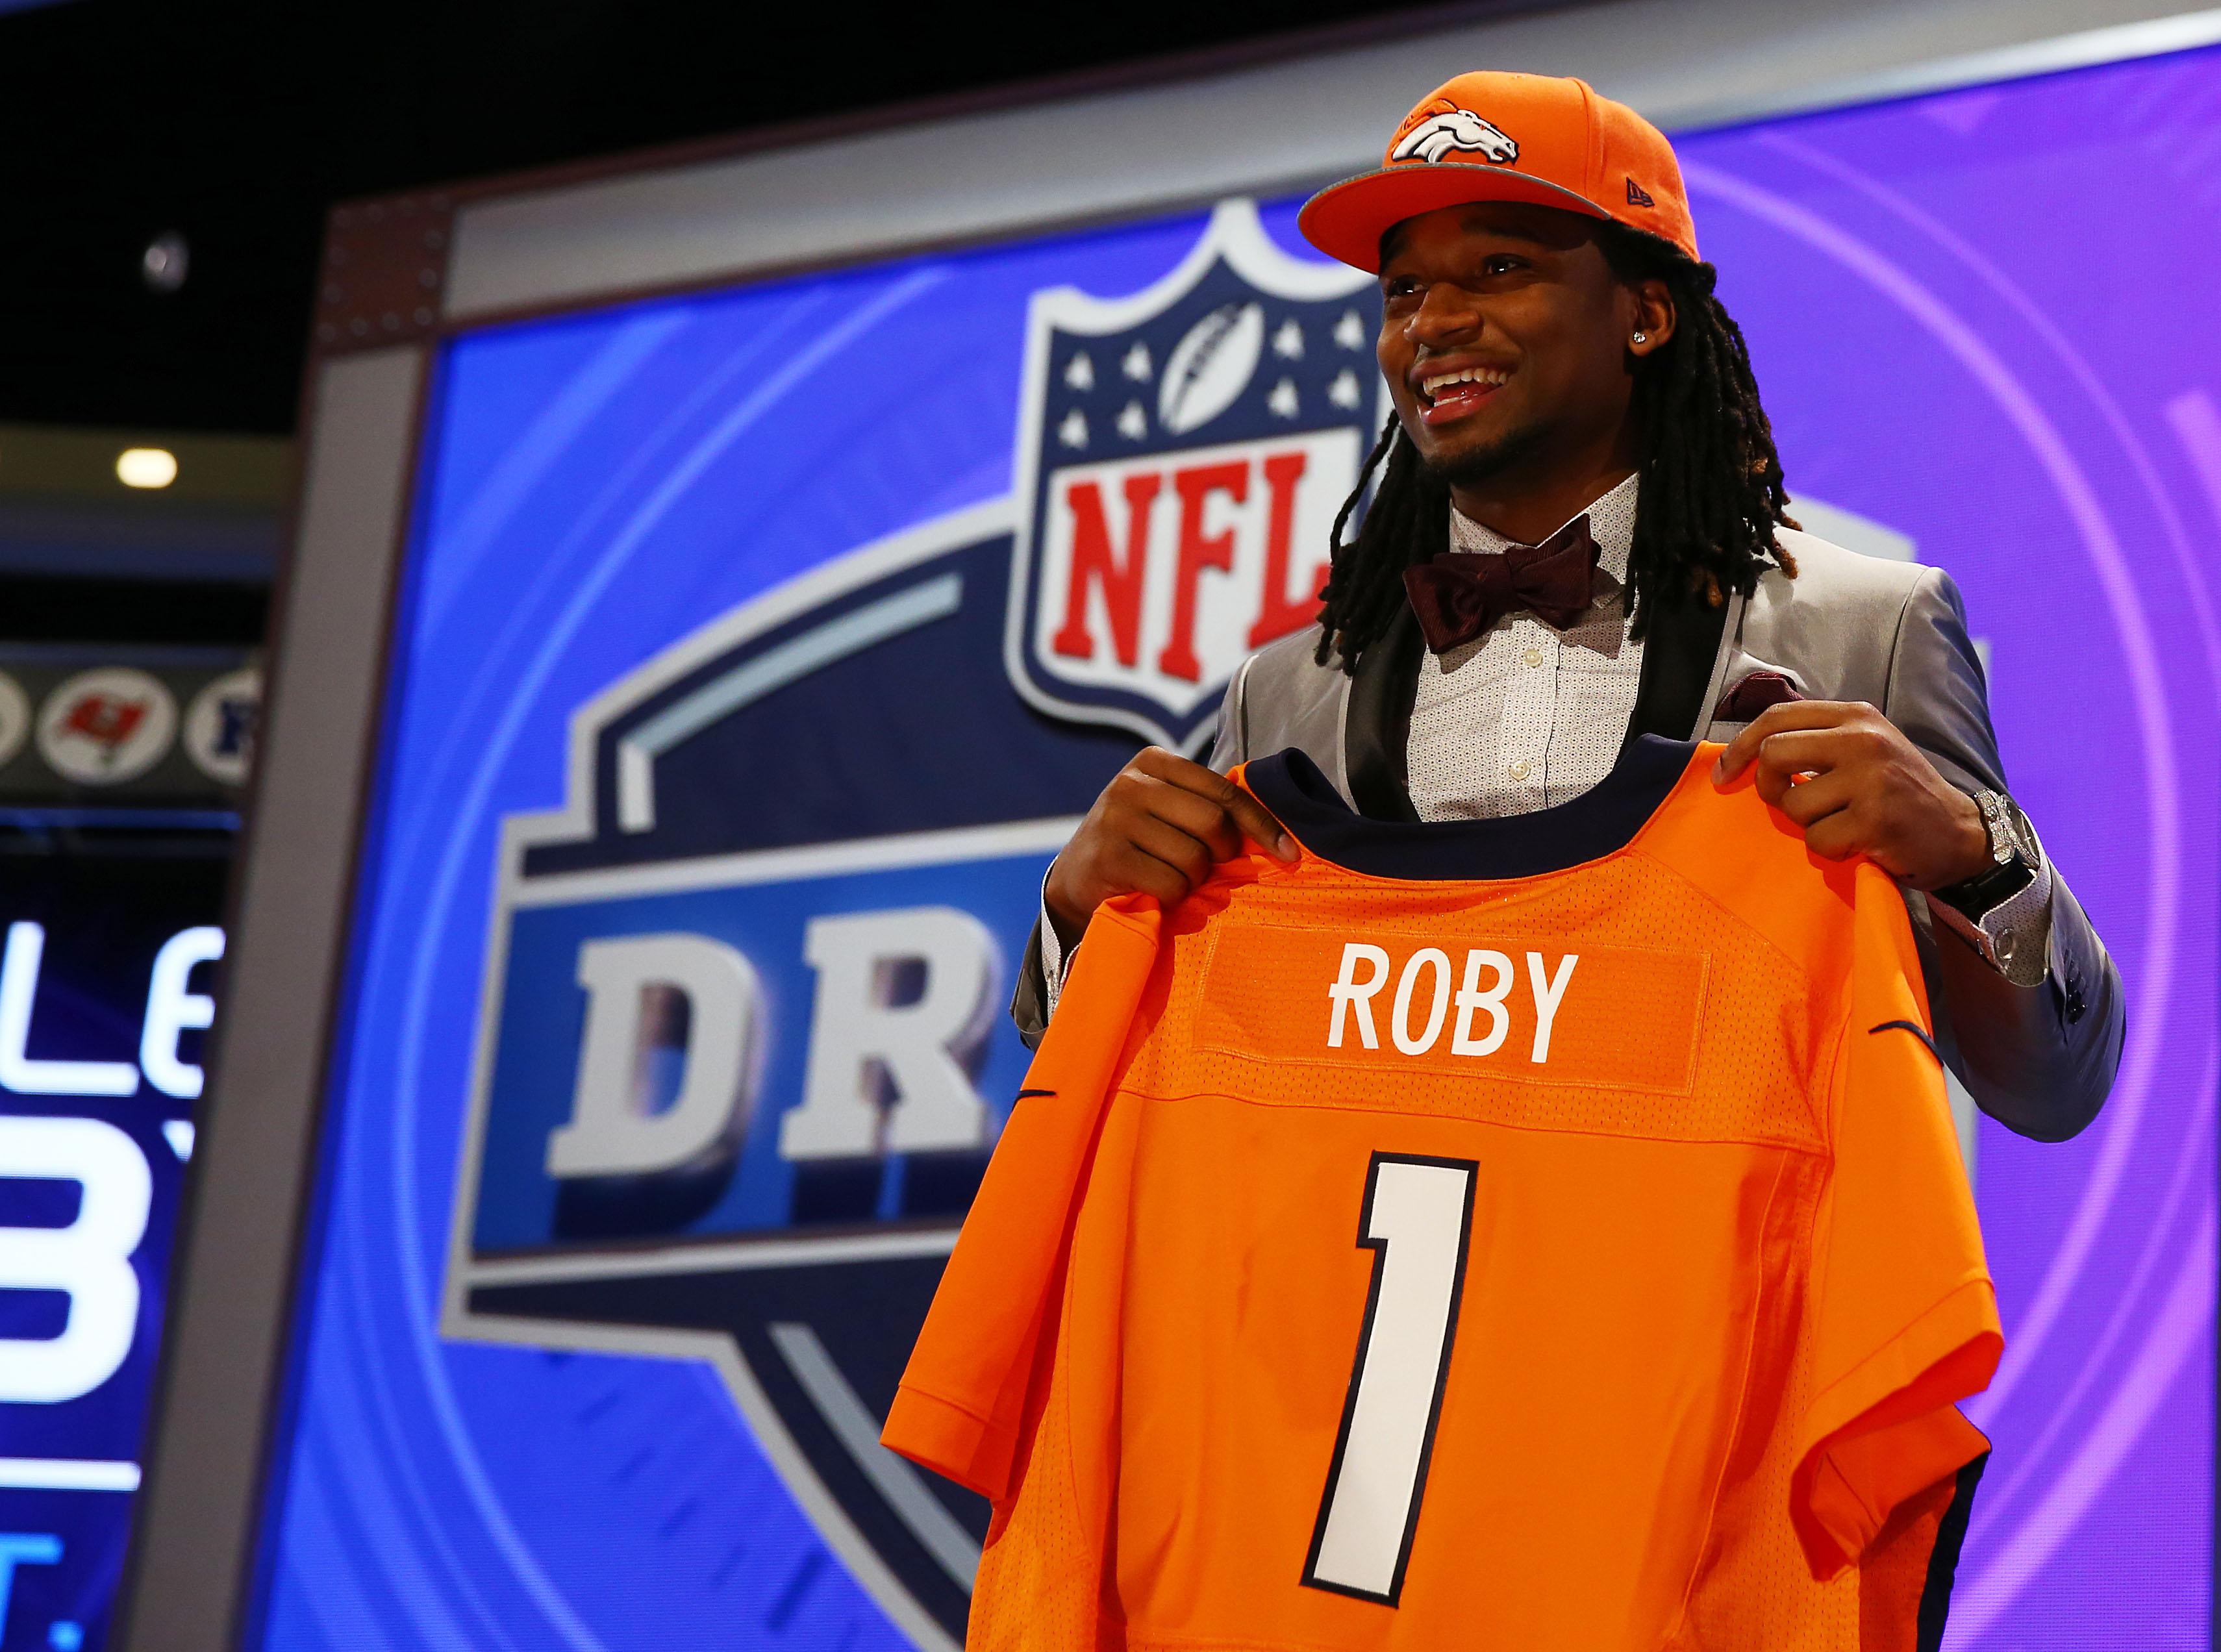 Bradley Roby thankful the Broncos did their homework | 9news.com